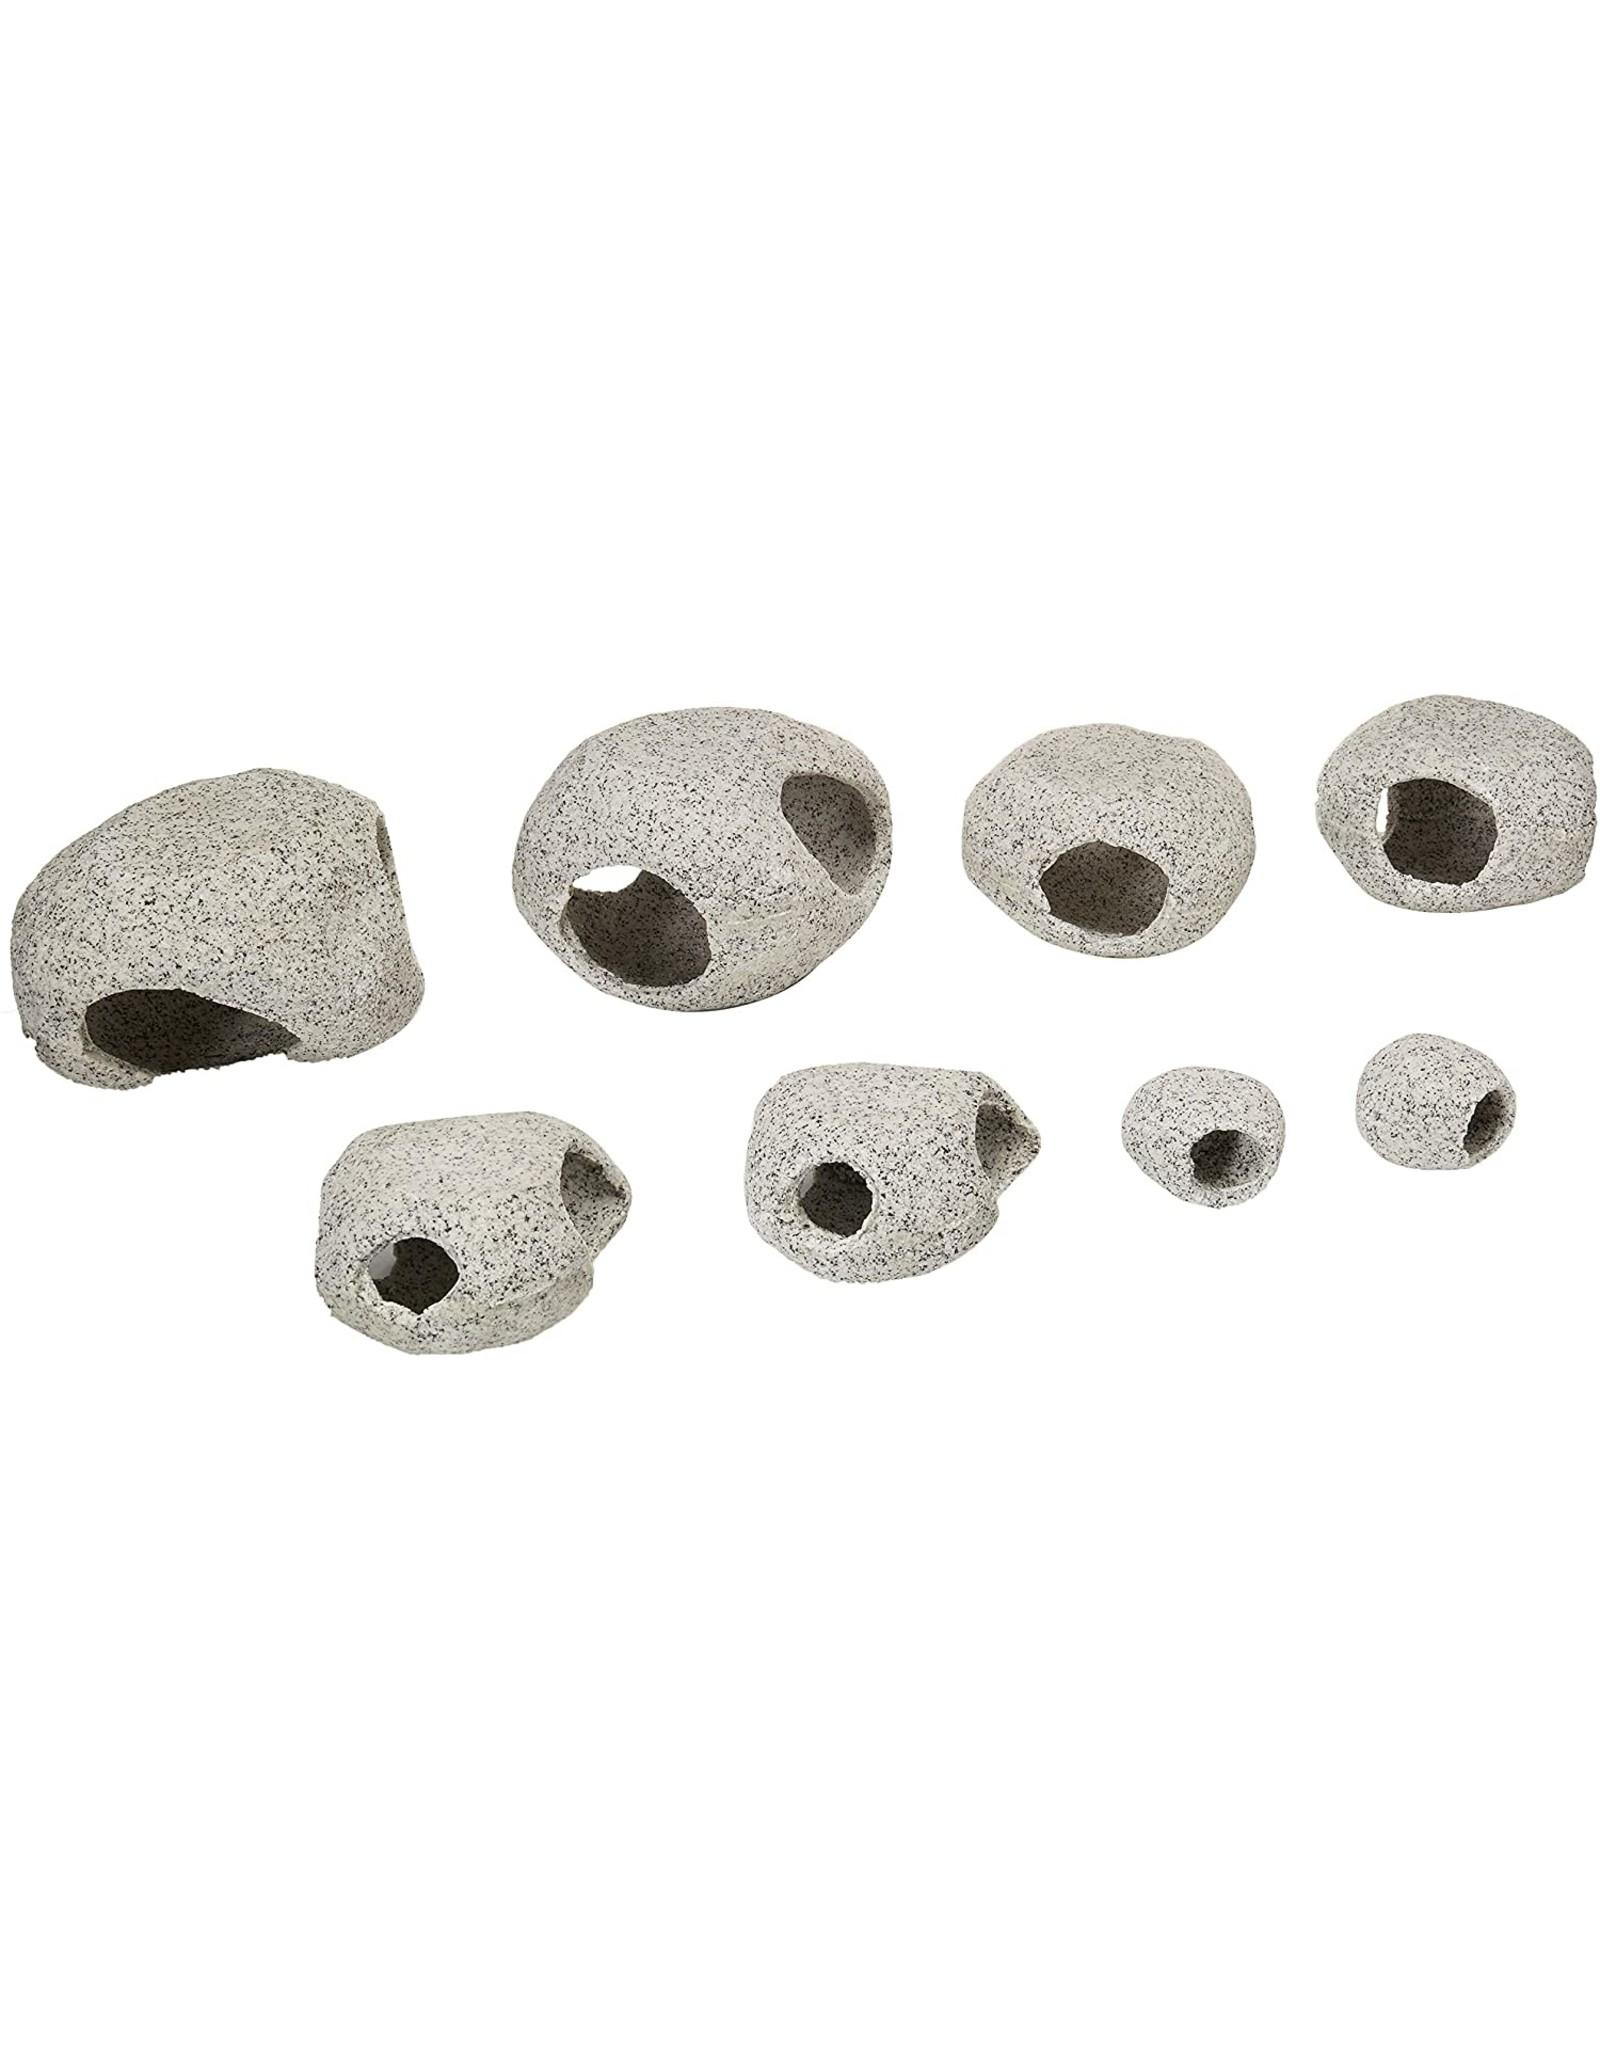 Penn Plax PENN PLAX Granite Hideaways 8 piece Assorted Prepack 4 Sizes 2 of Each